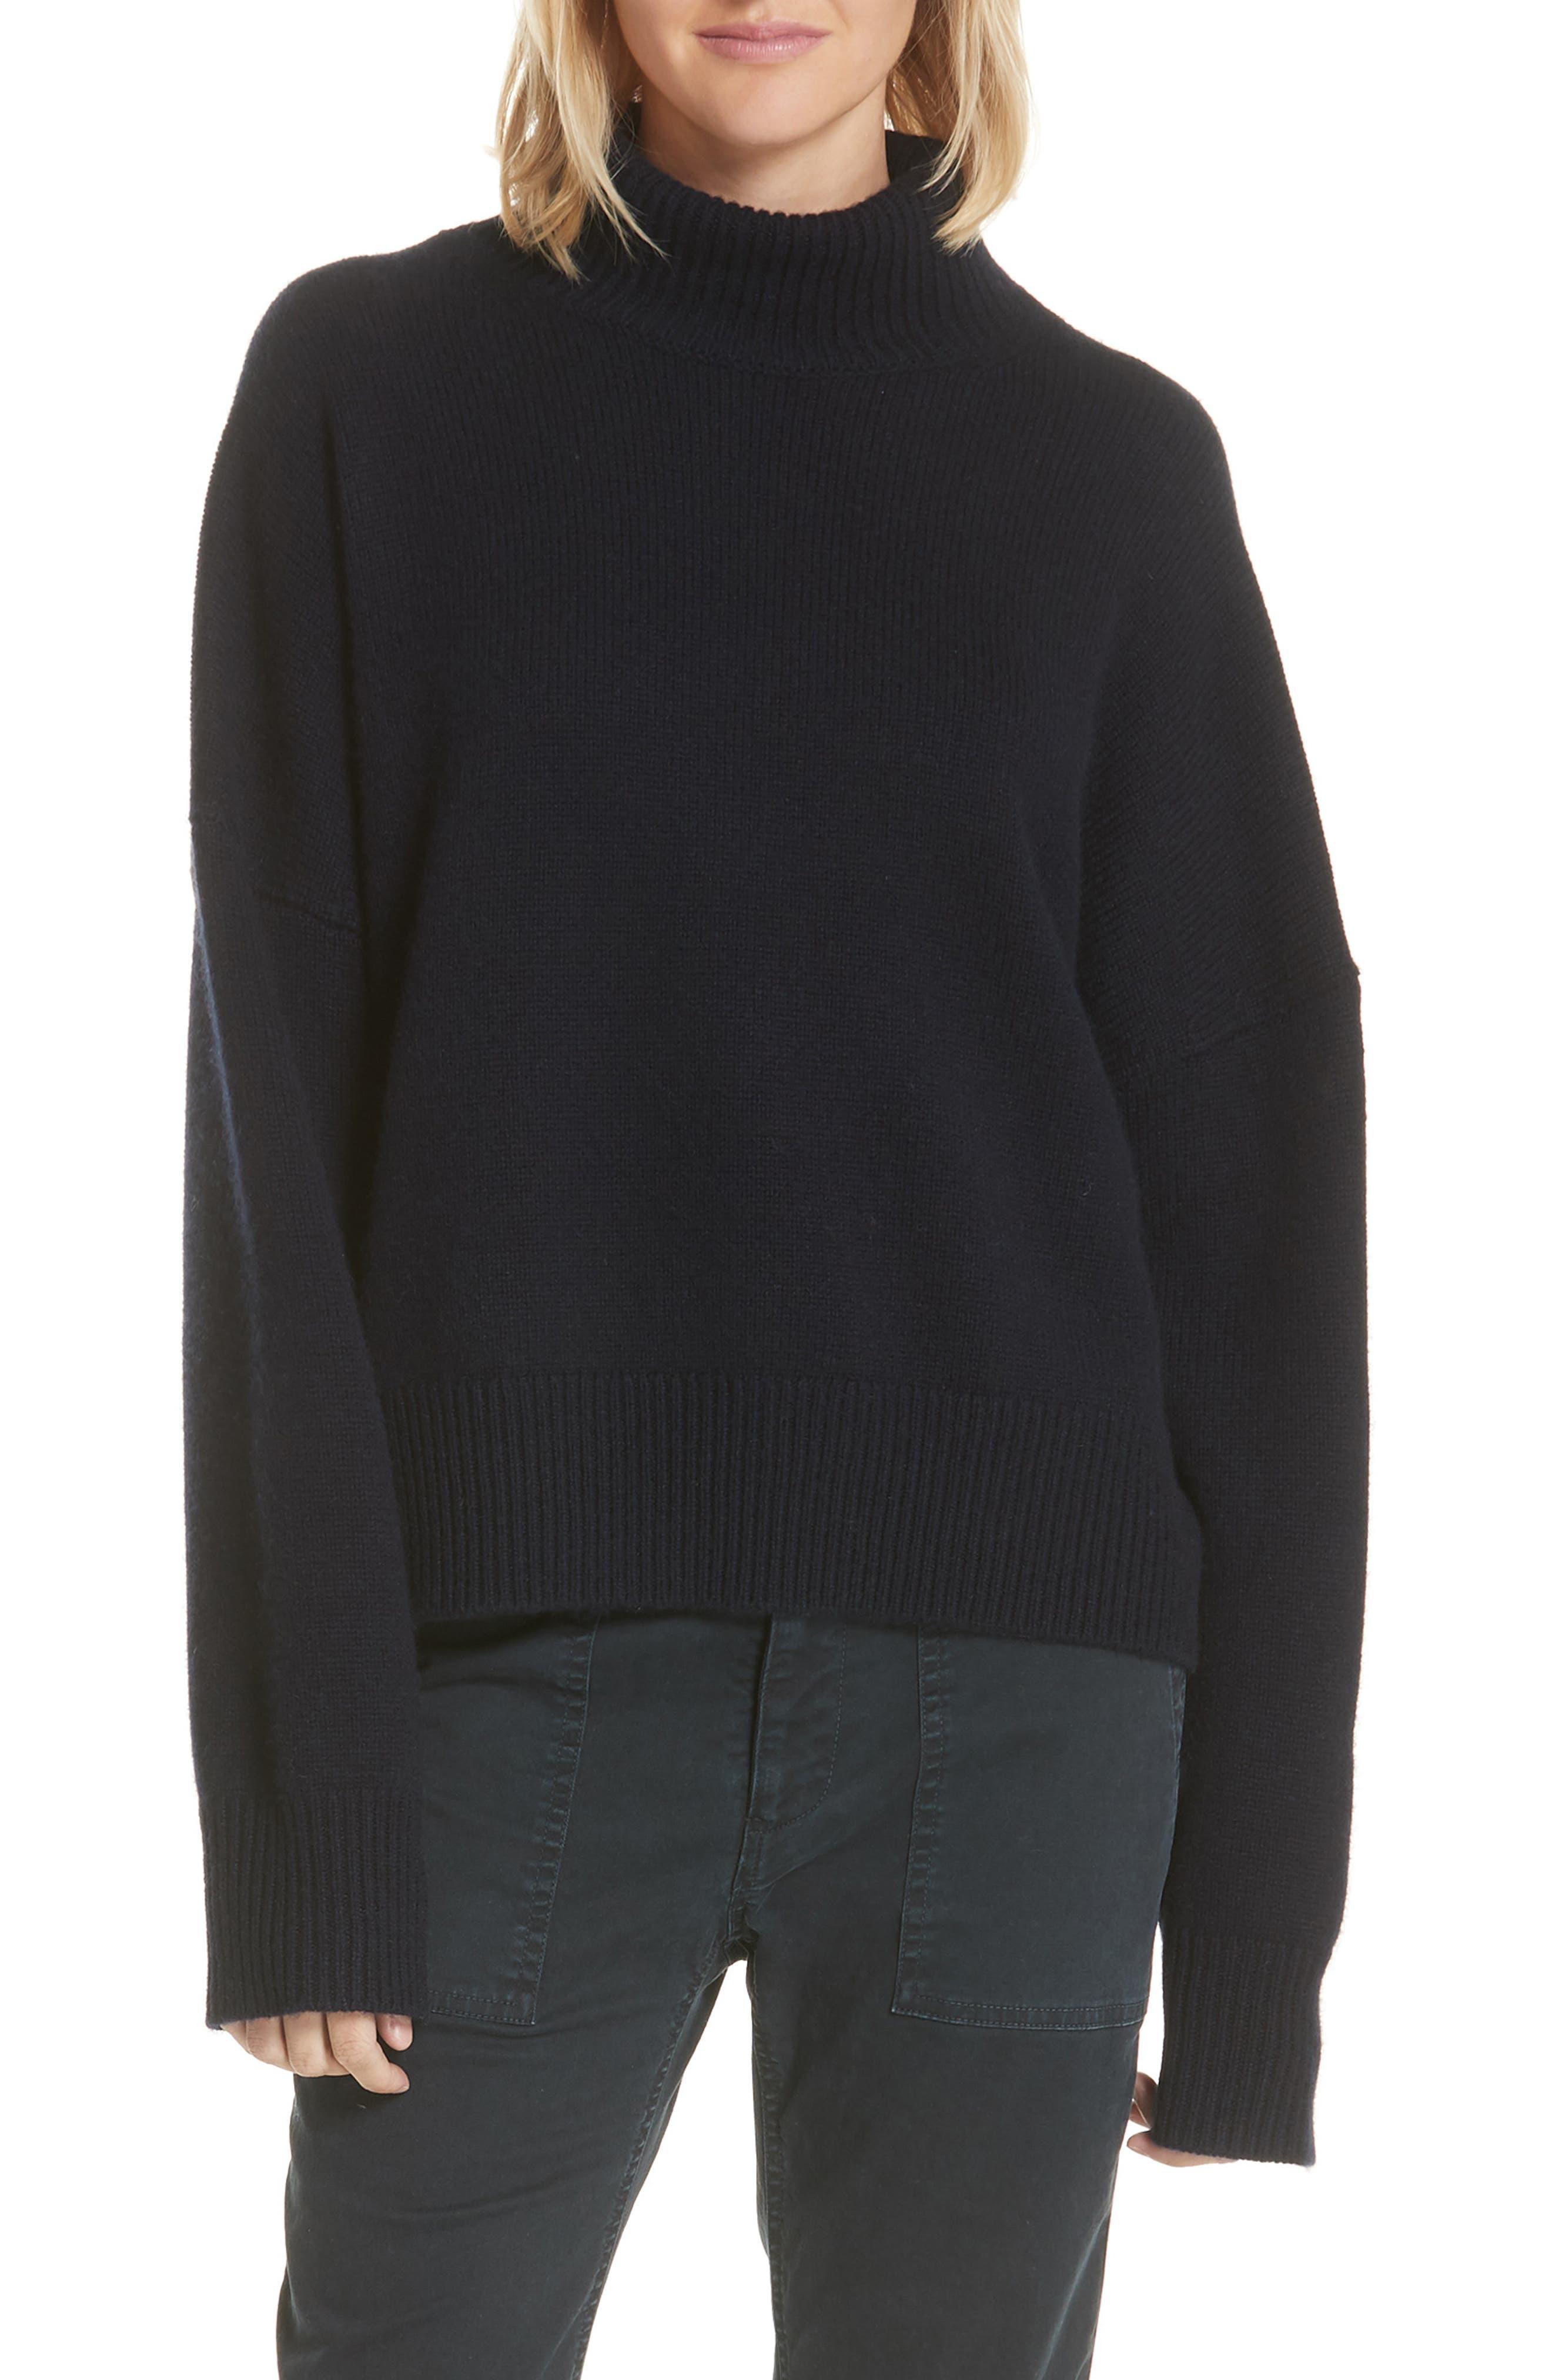 Serinda Wool & Cashmere Turtleneck Sweater,                             Main thumbnail 1, color,                             Dark Navy